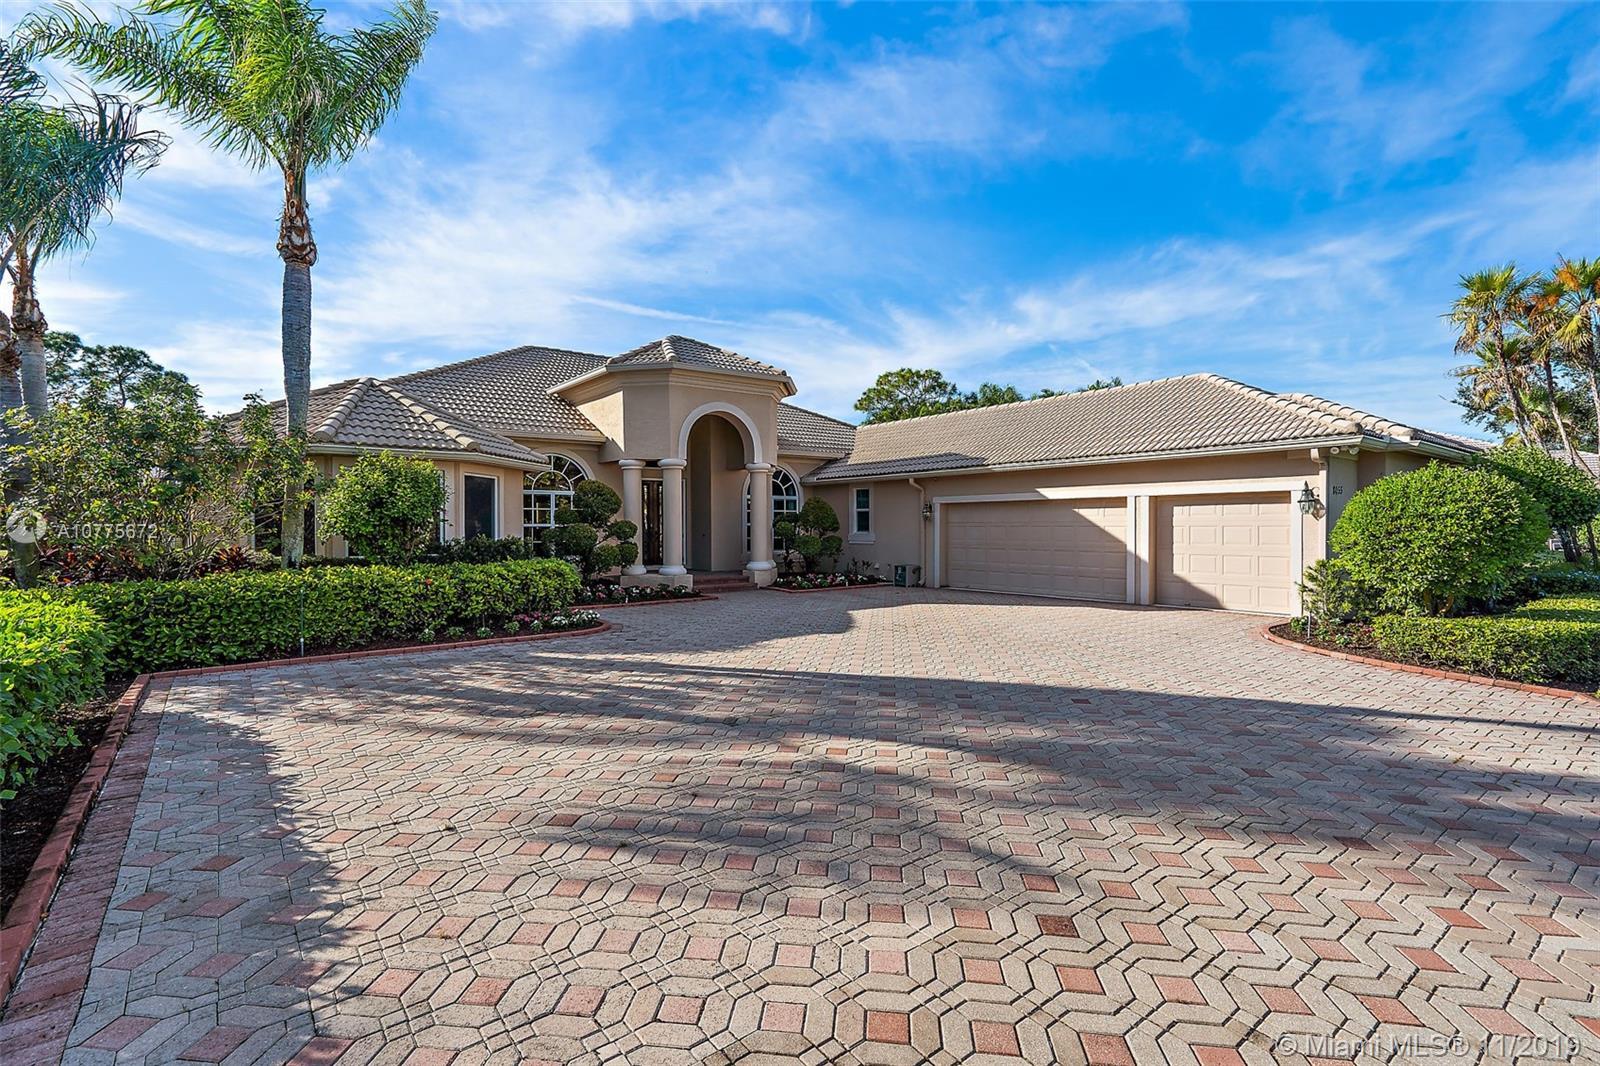 8055 Woodsmuir Dr, Palm Beach Gardens, FL 33412